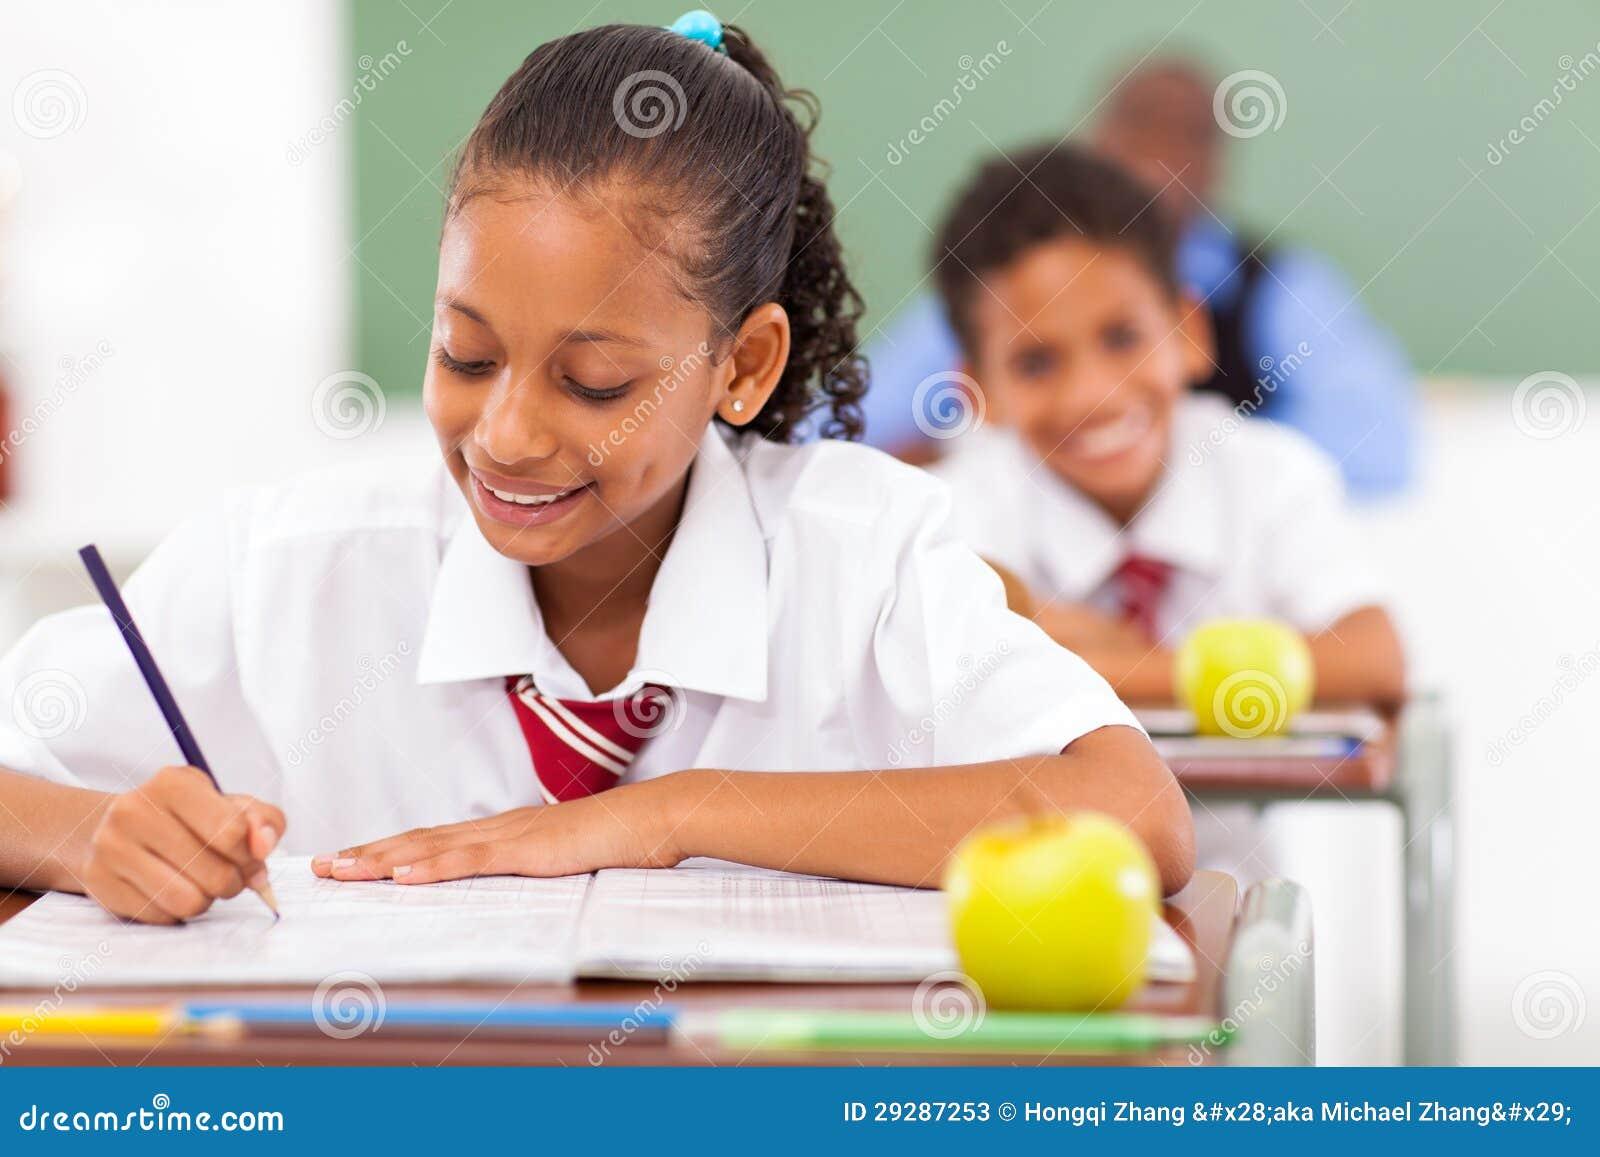 Primary School Students Stock Photos - Image: 29287253 Happy High School Student Clipart